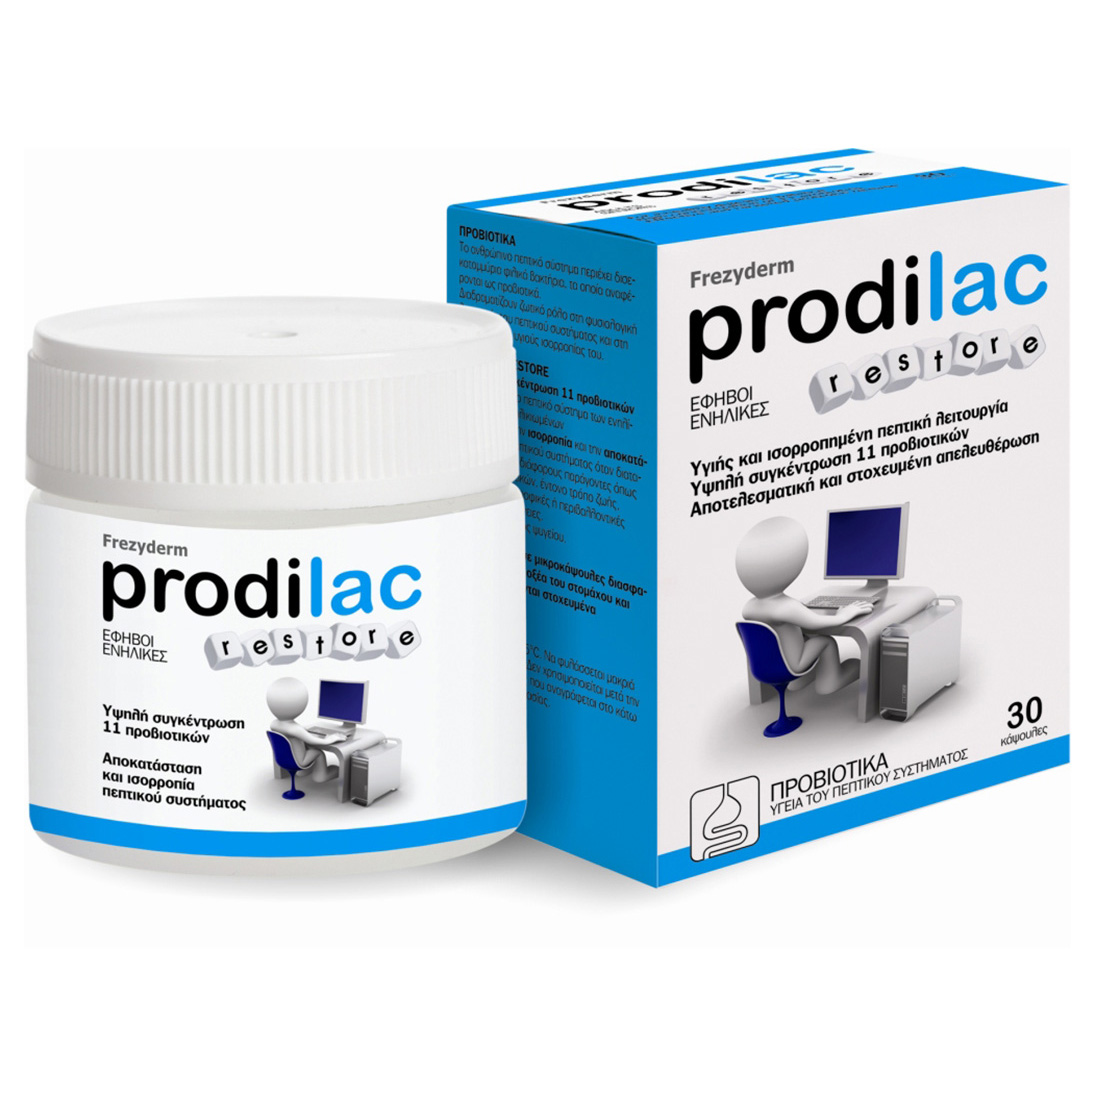 Frezyderm Prodilac Restore 30 Εντεροδιαλυτές Προβιοτικώνγια Έφηβους & Ενήλικες 16-50 Ετών 30caps